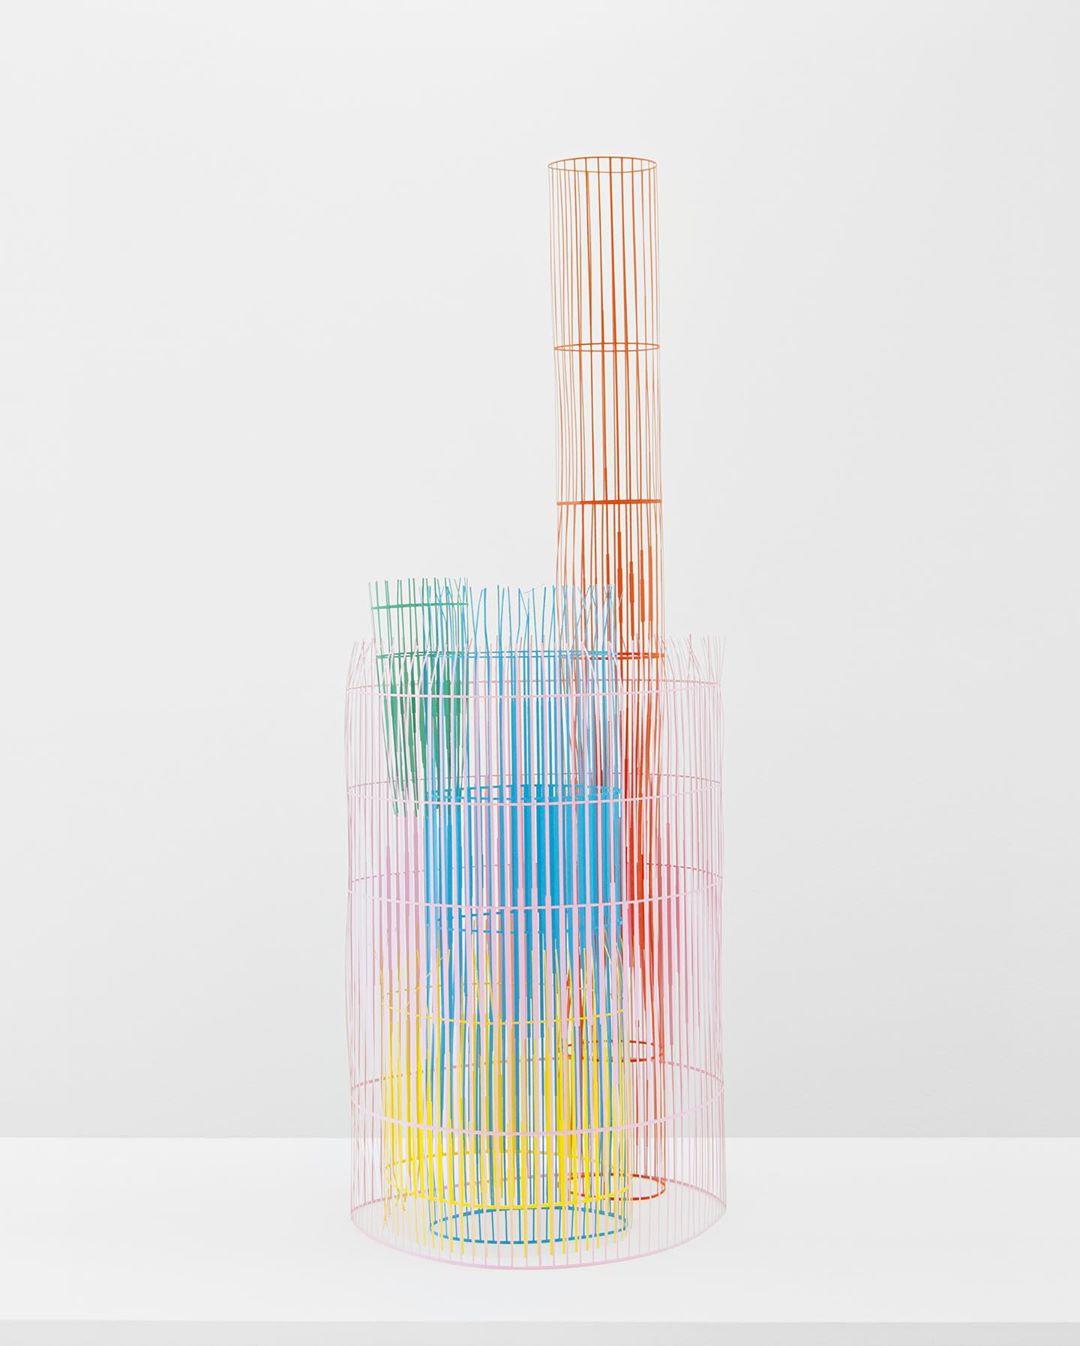 Armand, paper sculpture, 2013